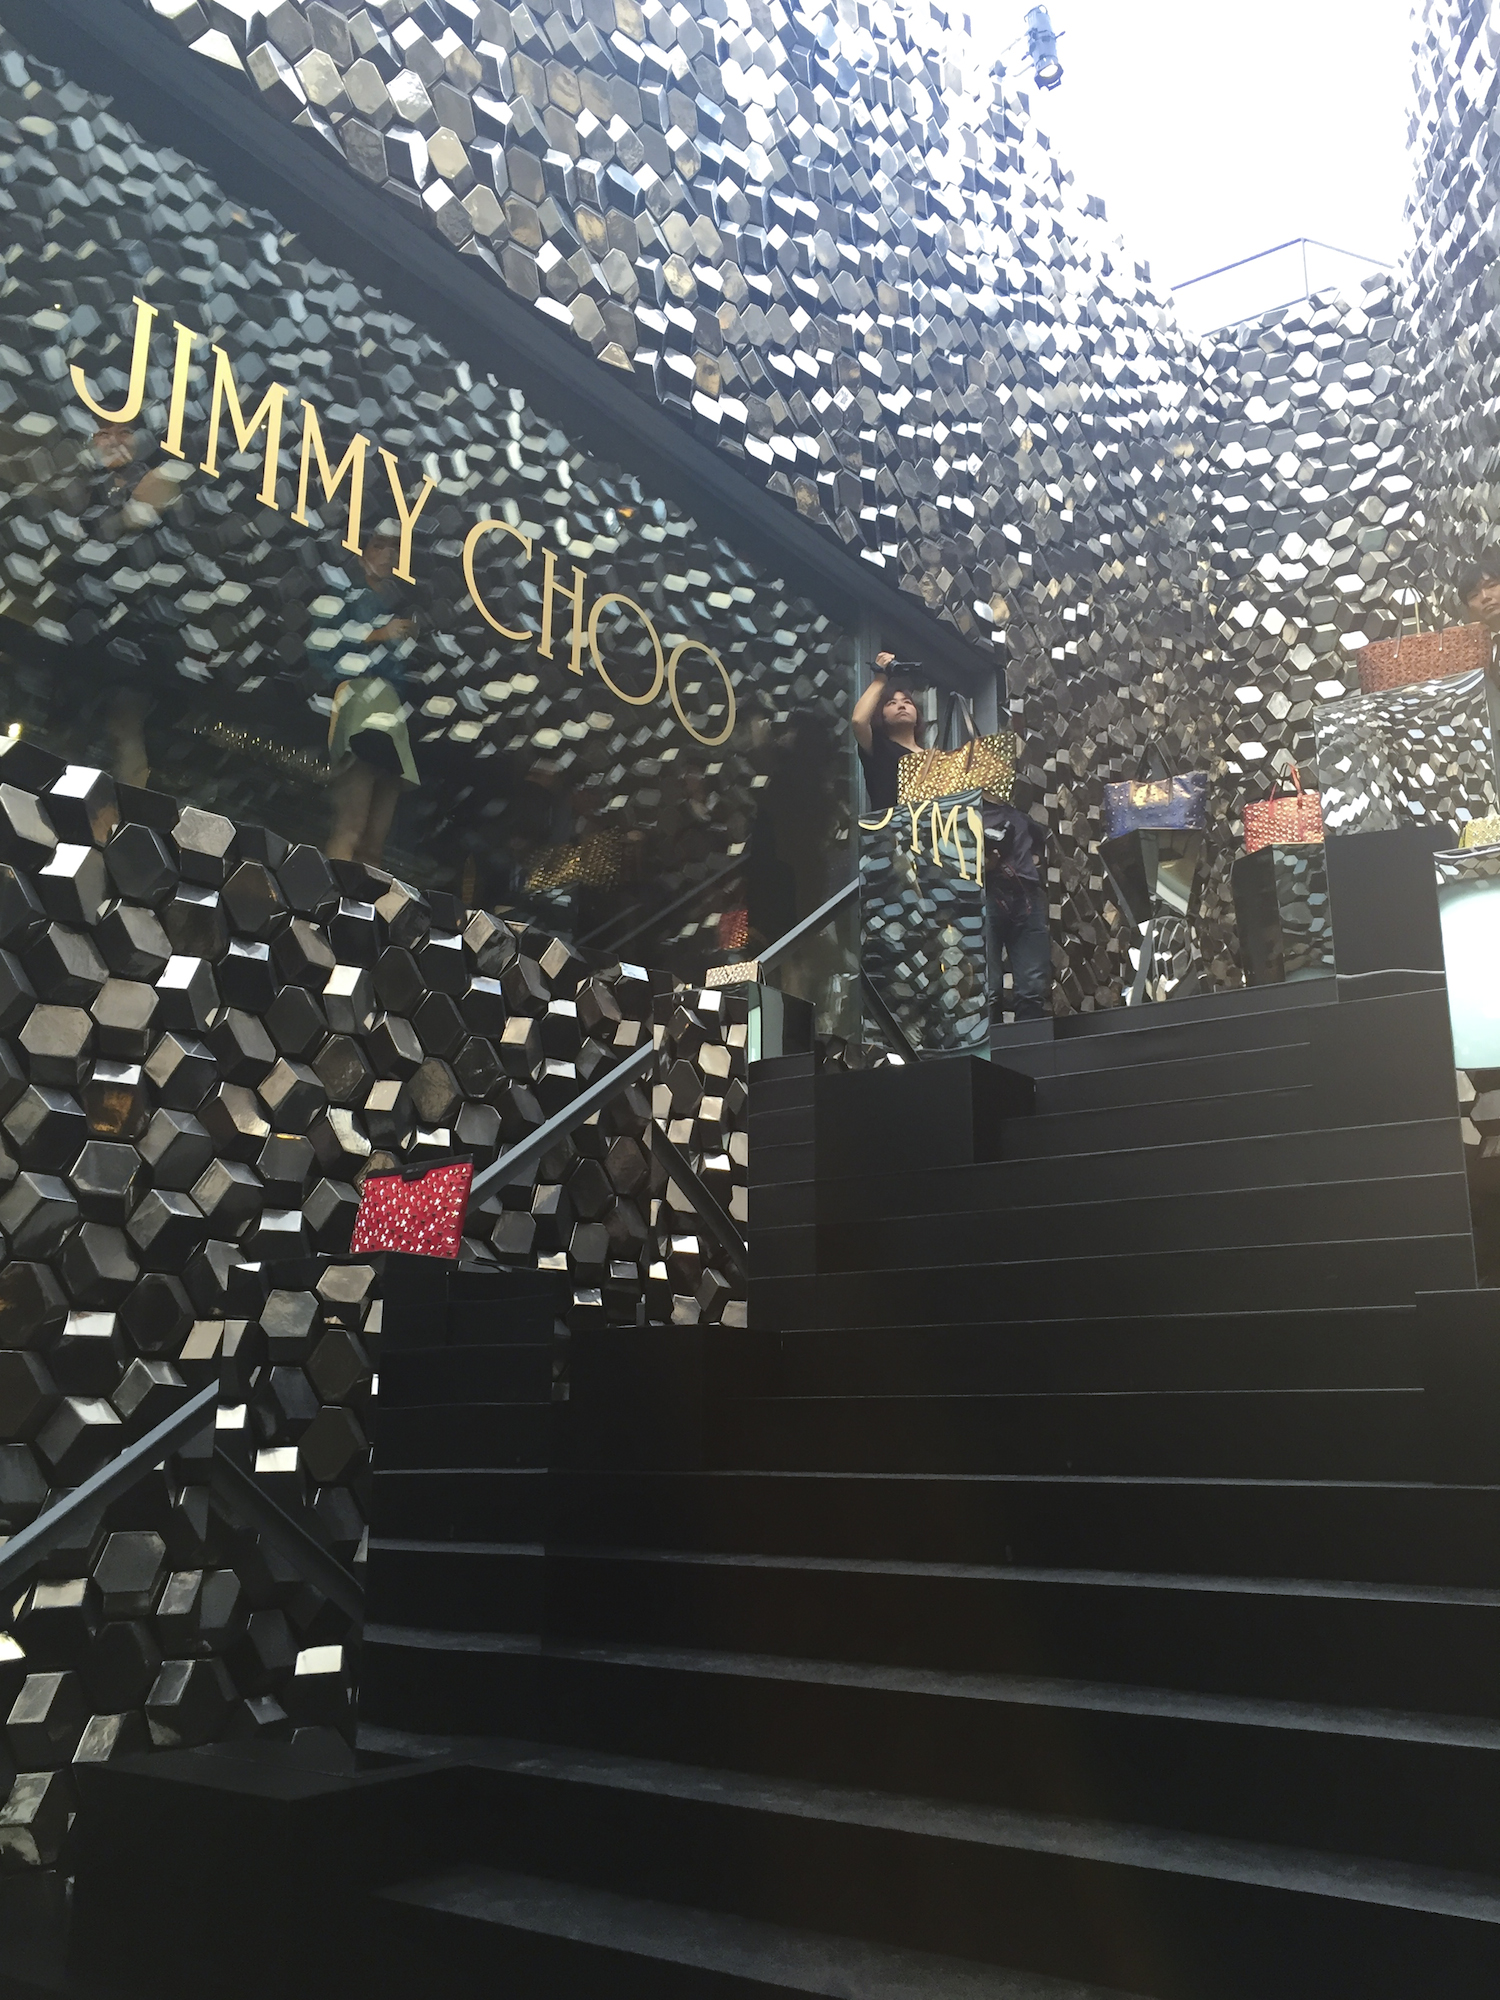 JIMMY CHOO_20th_2016aw_10